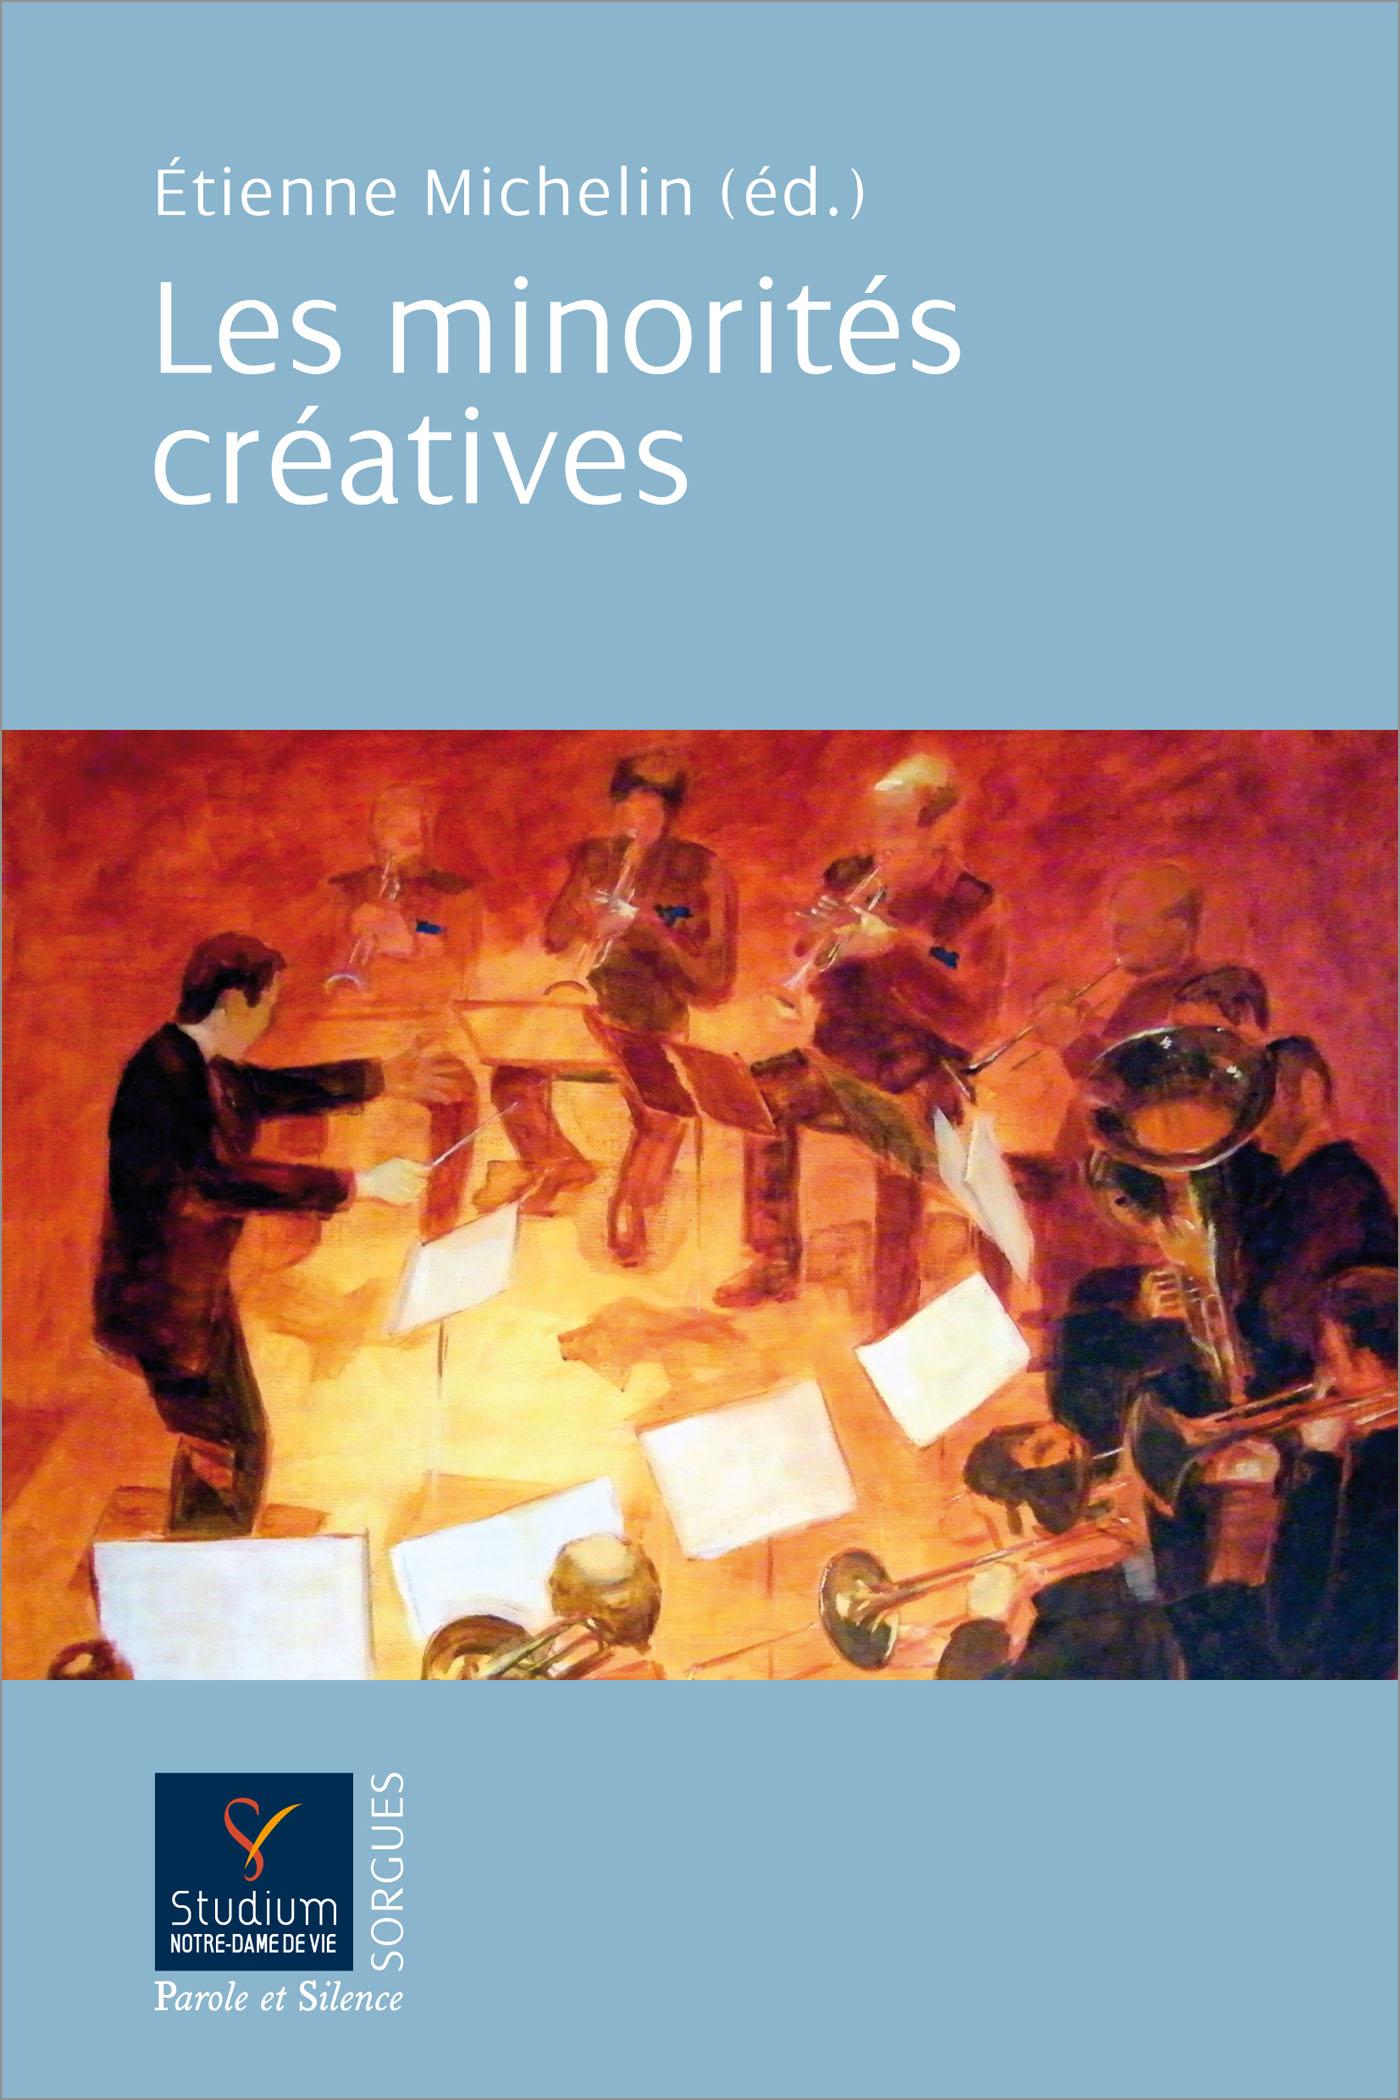 Les minorités créatives